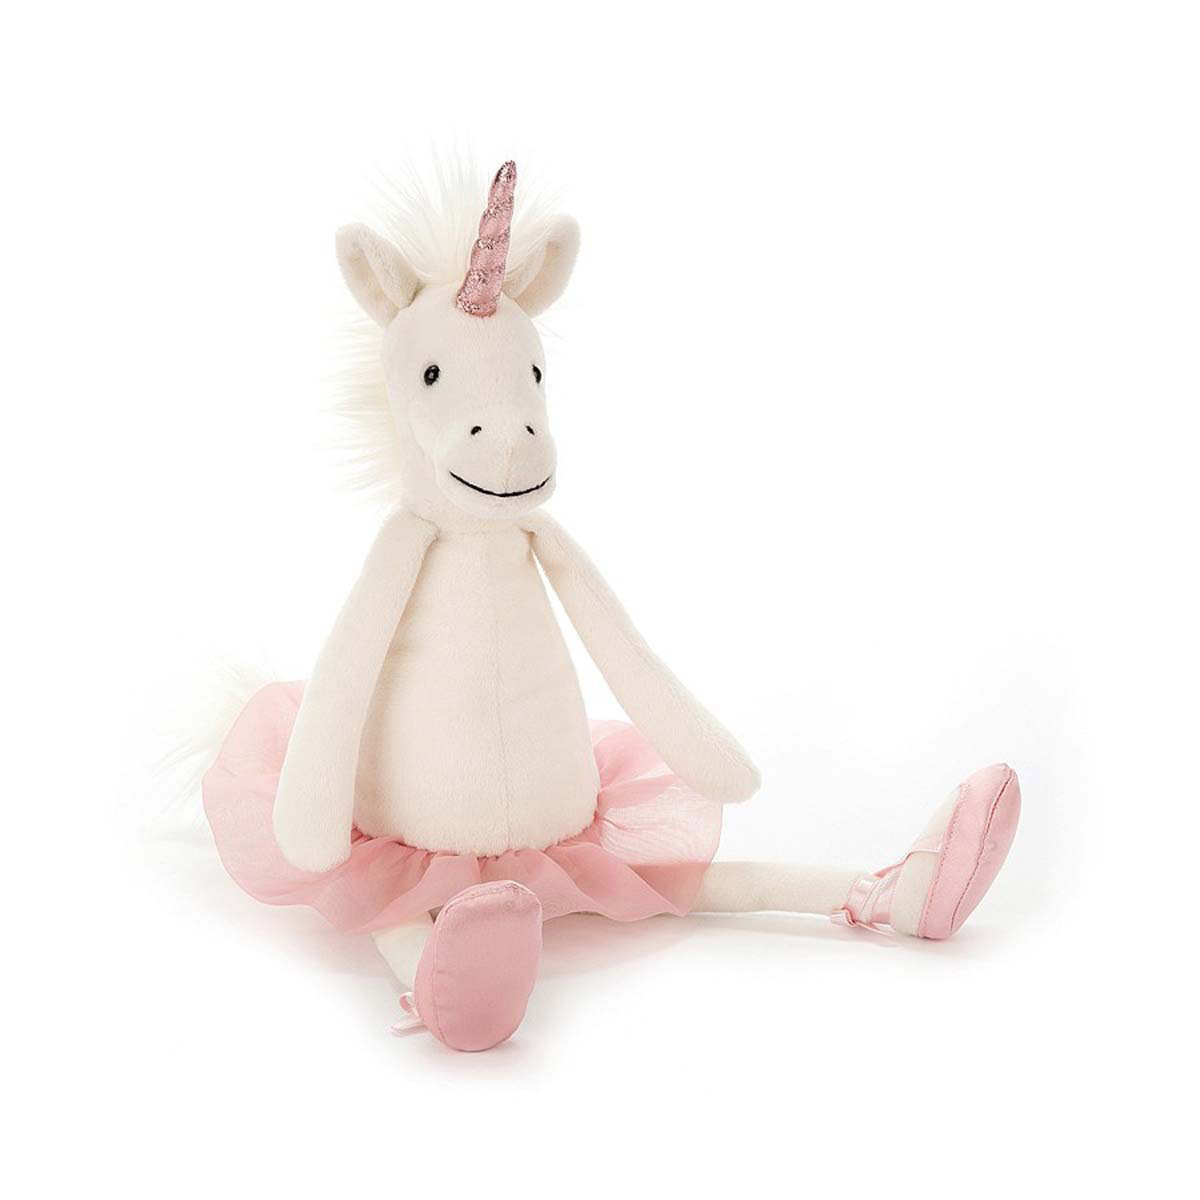 Peluche Dancing Darcey Unicorn - Medium Dancing Darcey Unicorn - Medium